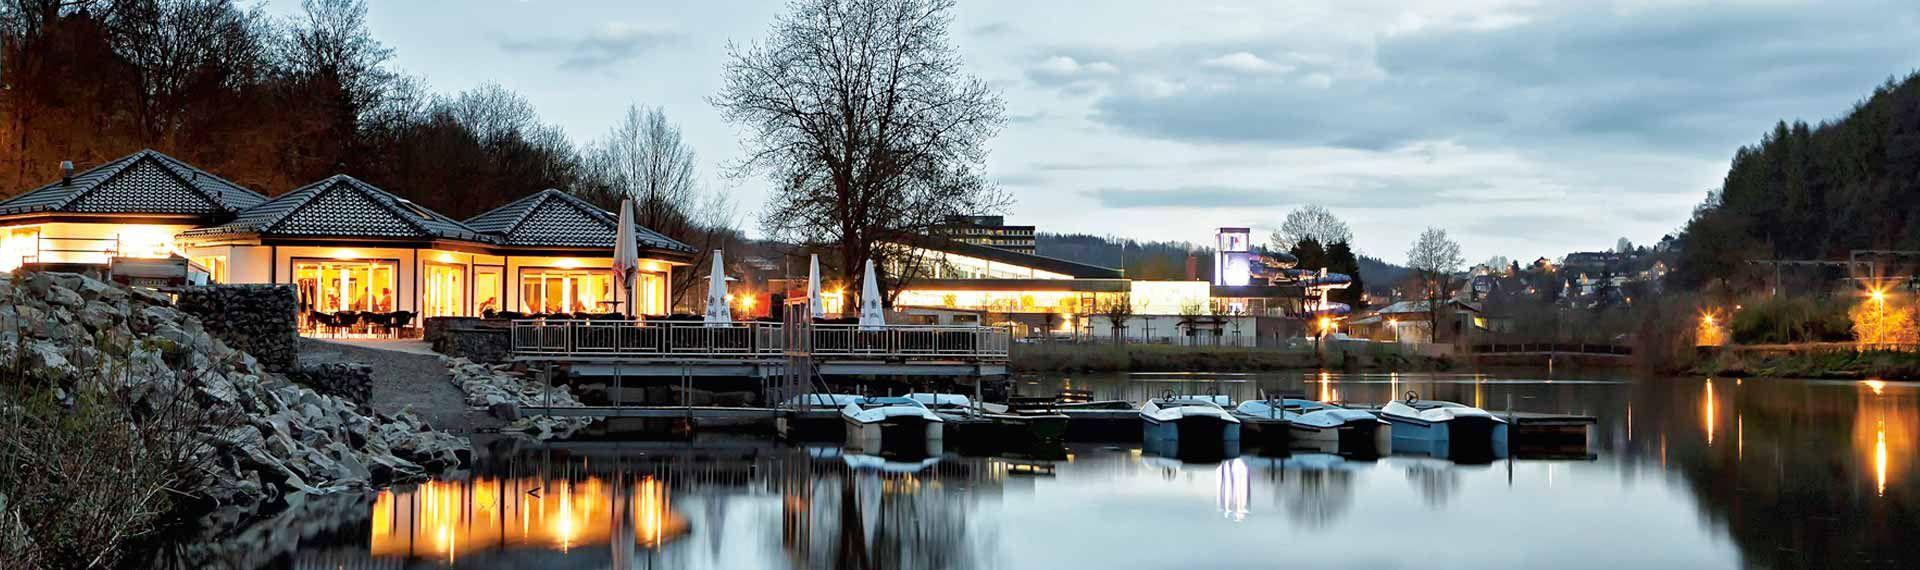 bootshaus olpe biggesee cafe restaurant lokal see